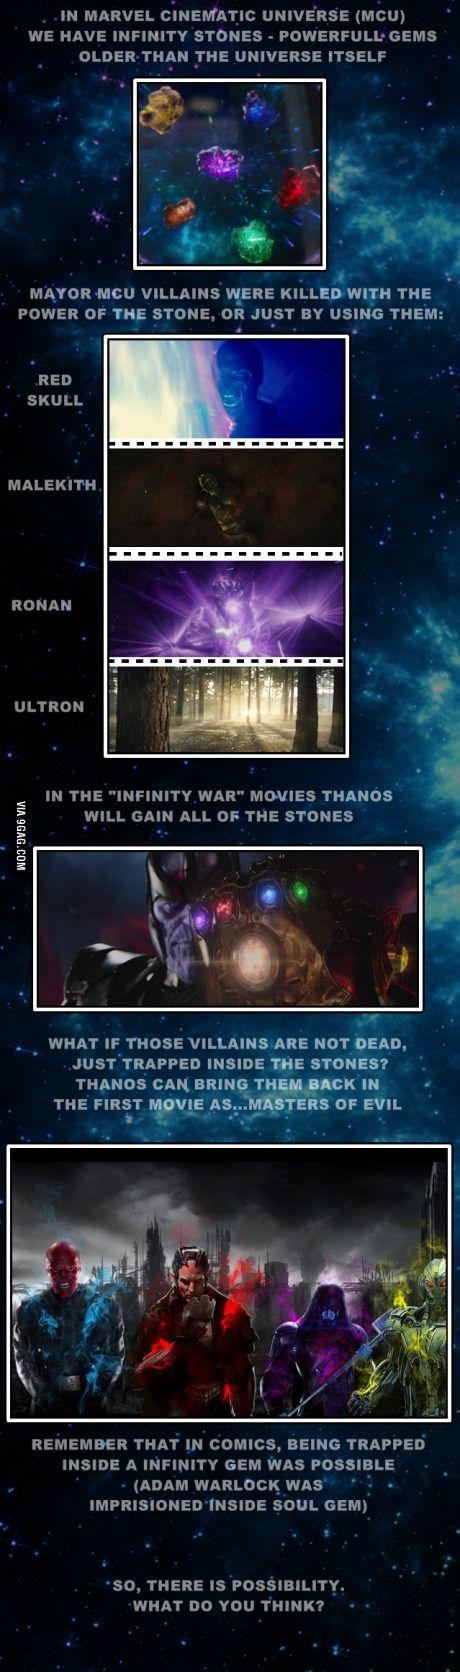 """Avengers: Infinity War part I"" idea on 9GAG"